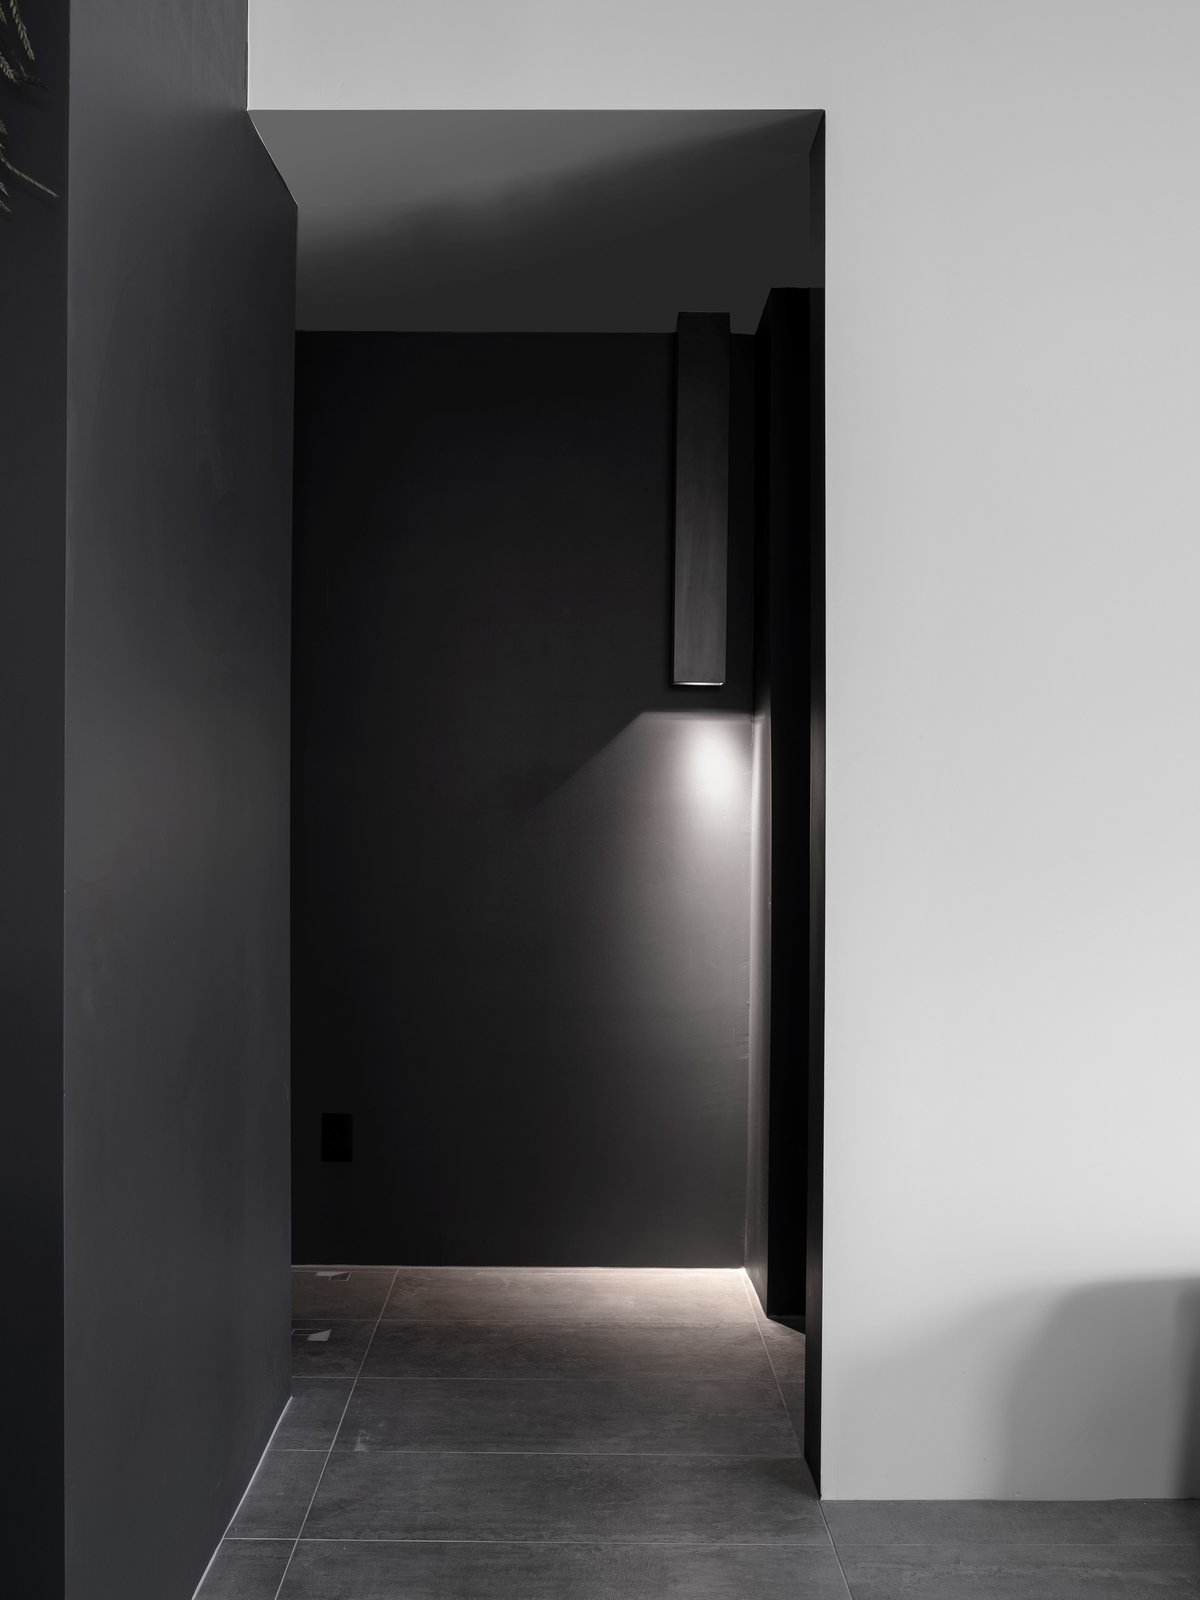 Hallway and Porcelain Tile Floor A hall light detail that discretely illuminates the floor of the black hallway.  Details